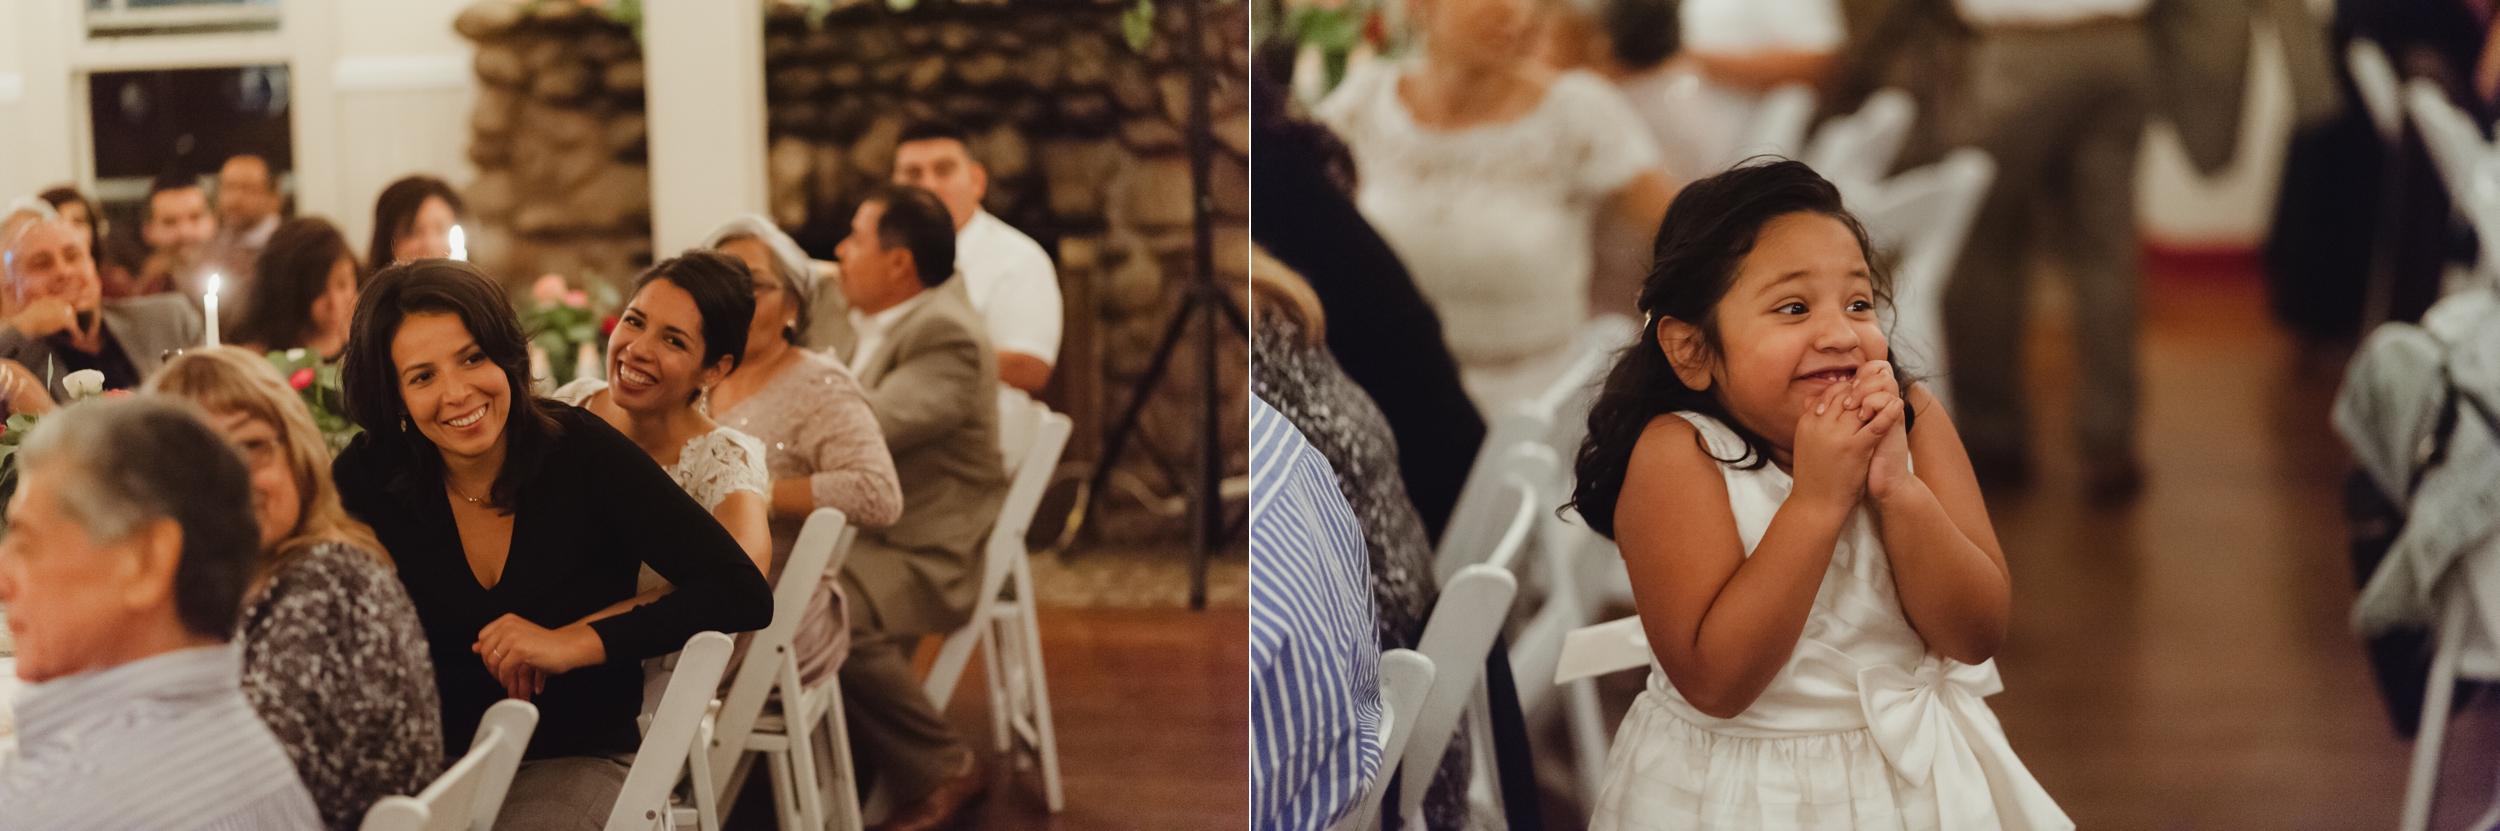 83san-francisco-stern-grove-wedding-photographer-vivianchen-532_WEB.jpg